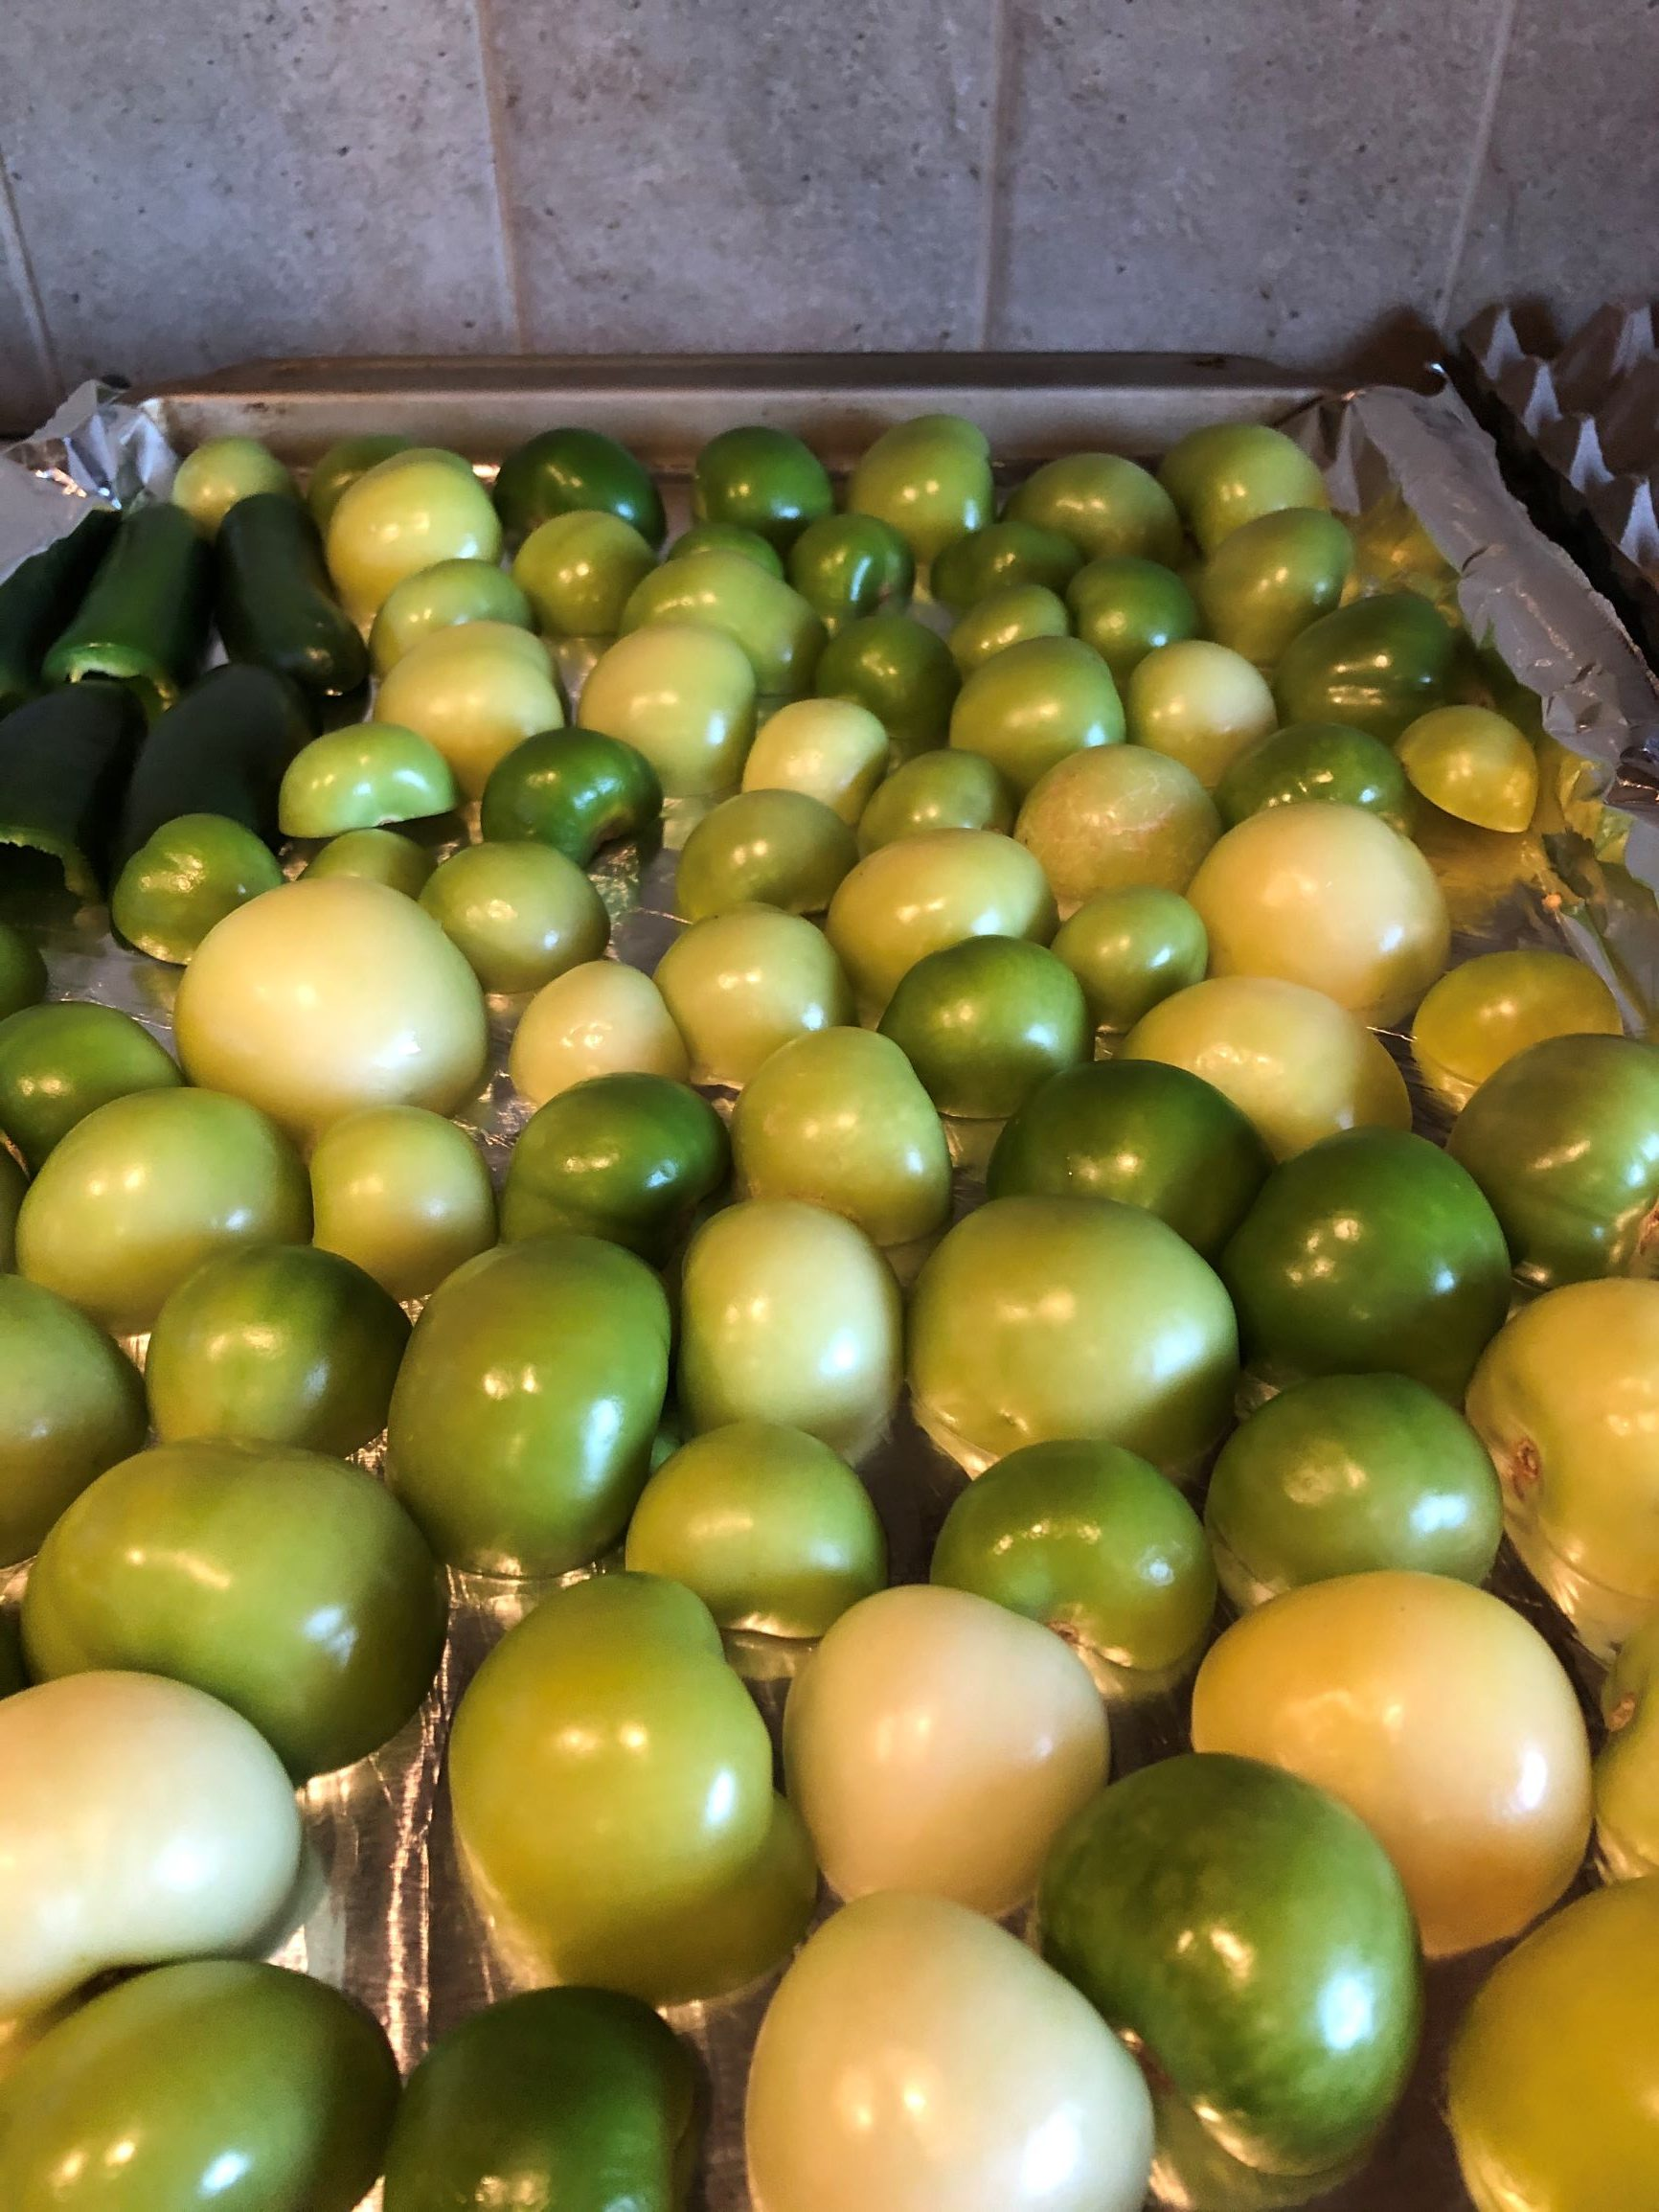 Tomatillos ready for roasting on a baking sheet